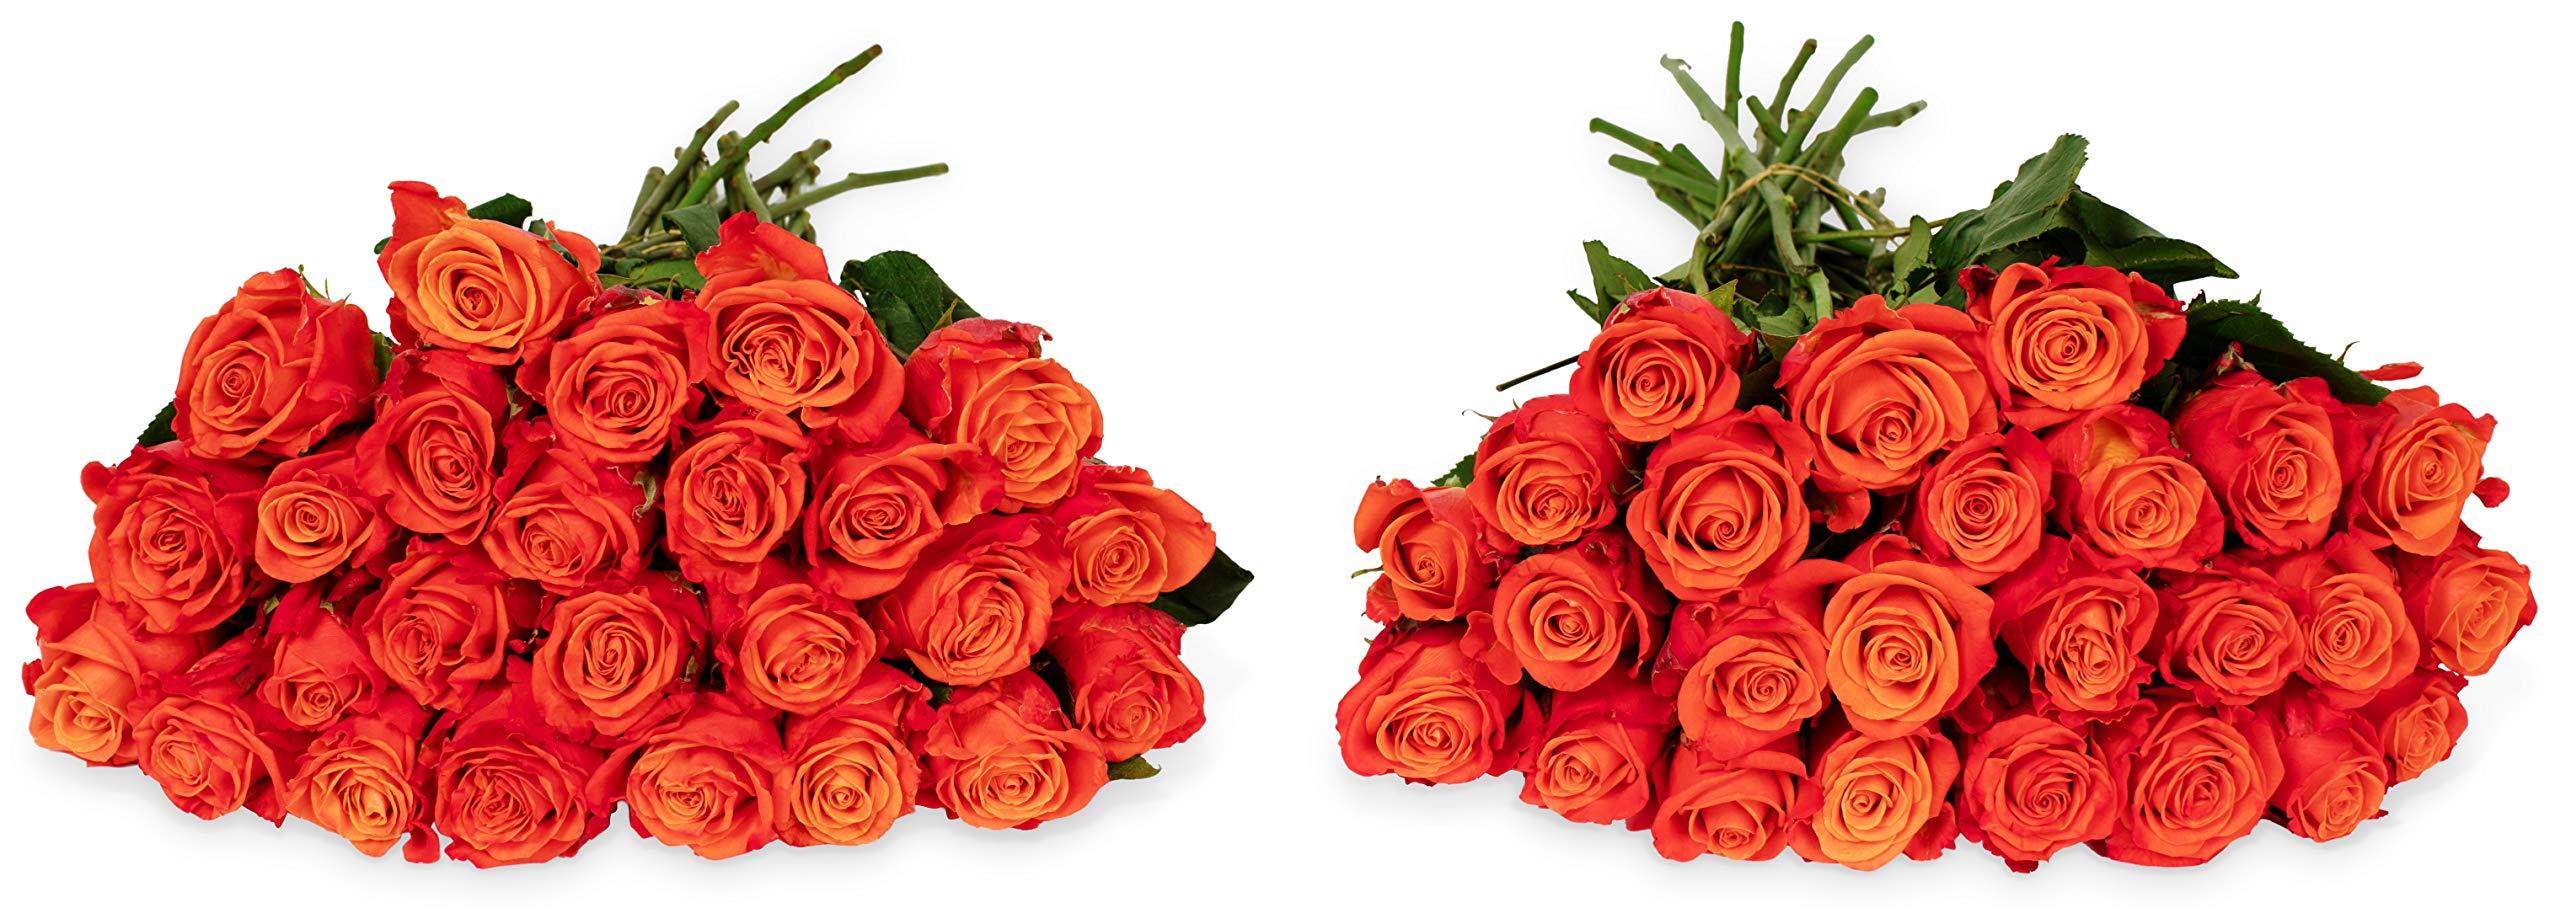 Benchmark Bouquets 50 Orange Roses Farm Direct (Fresh Cut Flowers)